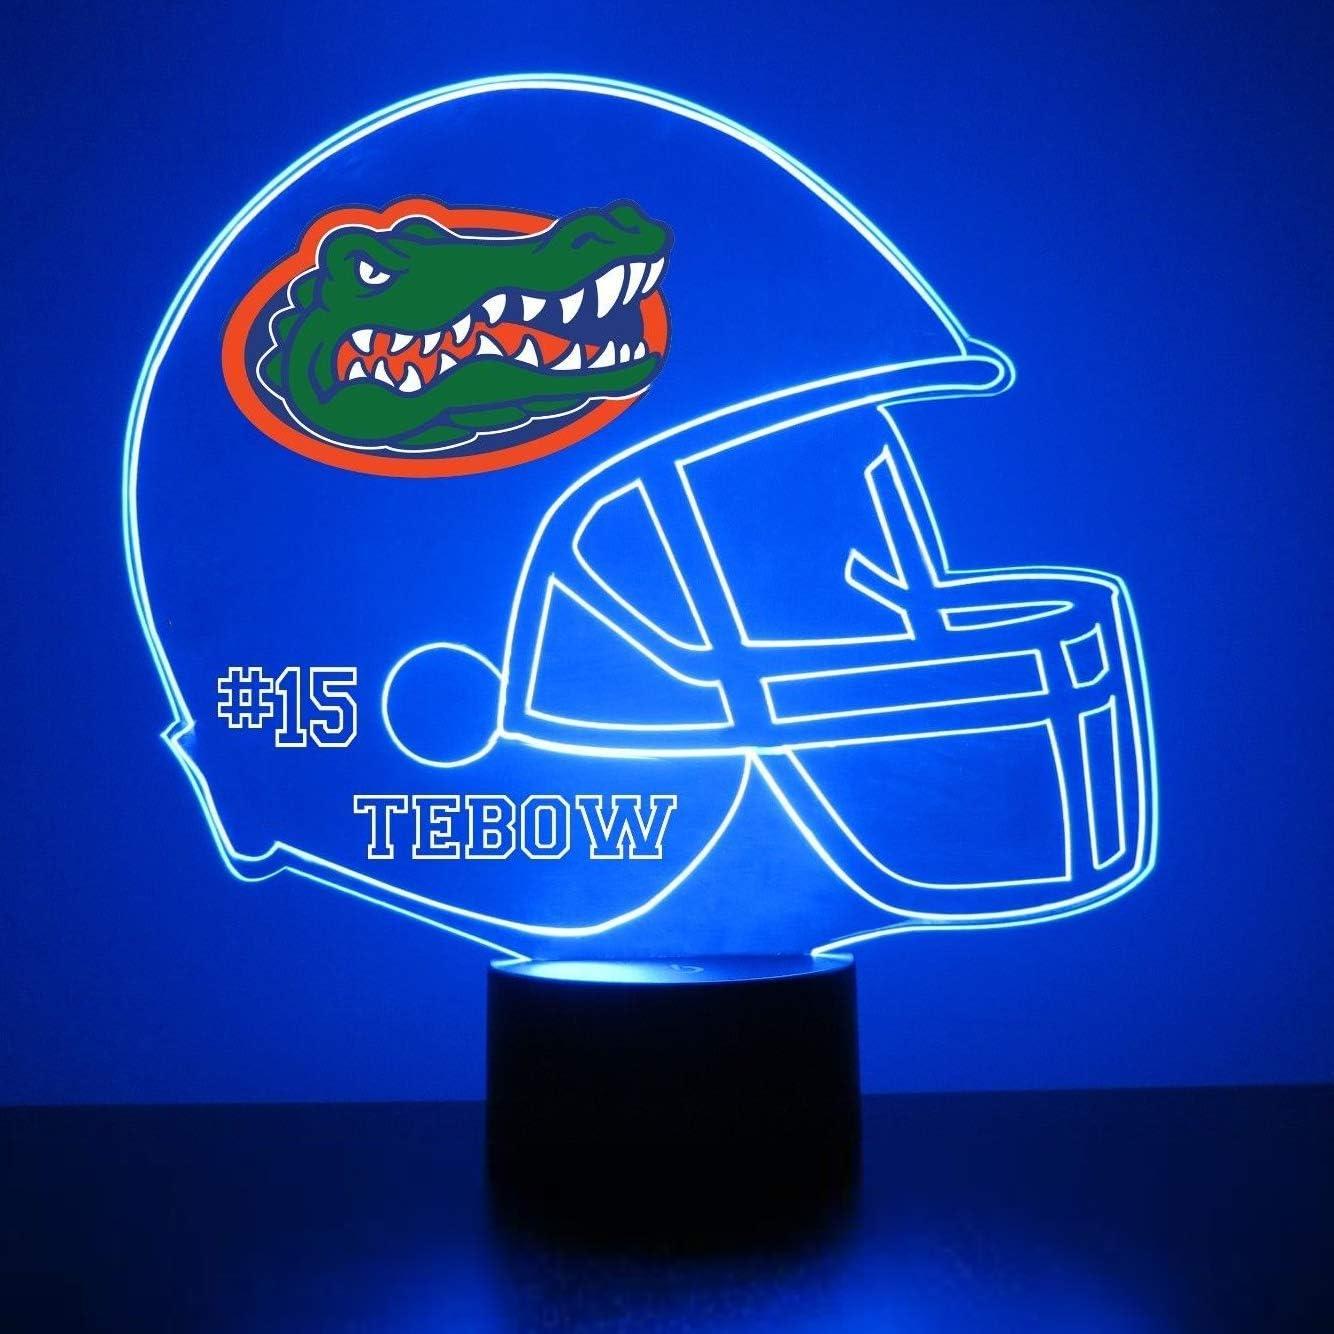 Mancave Light Team Color Wall Light 12.5 x 7.5 Party Animal NCAA Florida Gators Unisex Florida Gators MotiGlow Shade//Sleeve